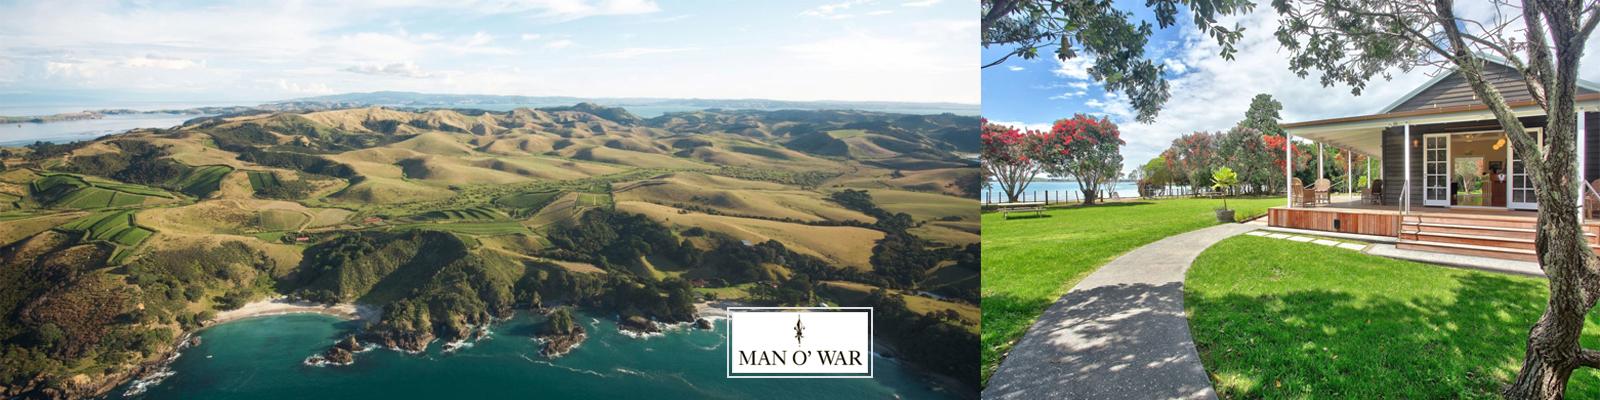 banner-man-o-war-vineyards.jpg